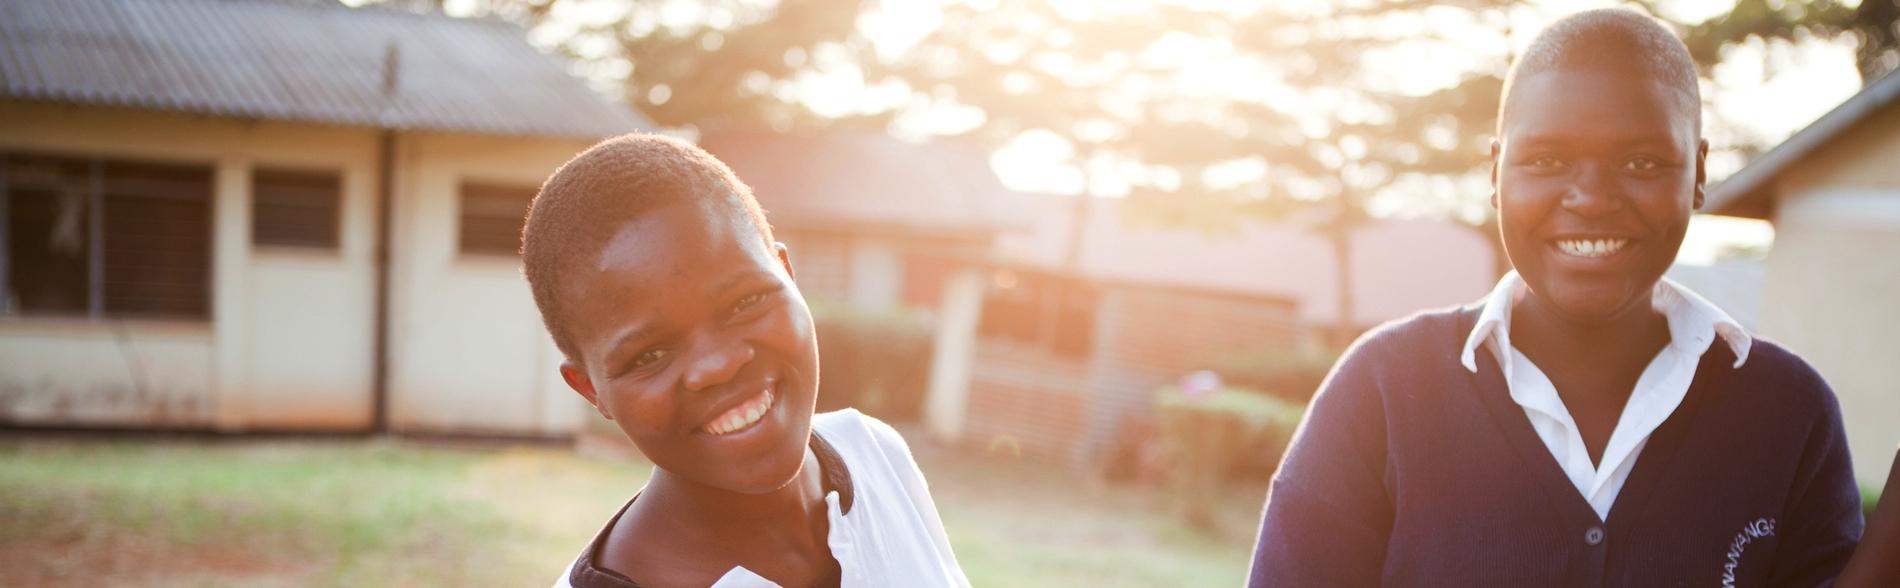 - Empowering girl entrepreneurs and leaders